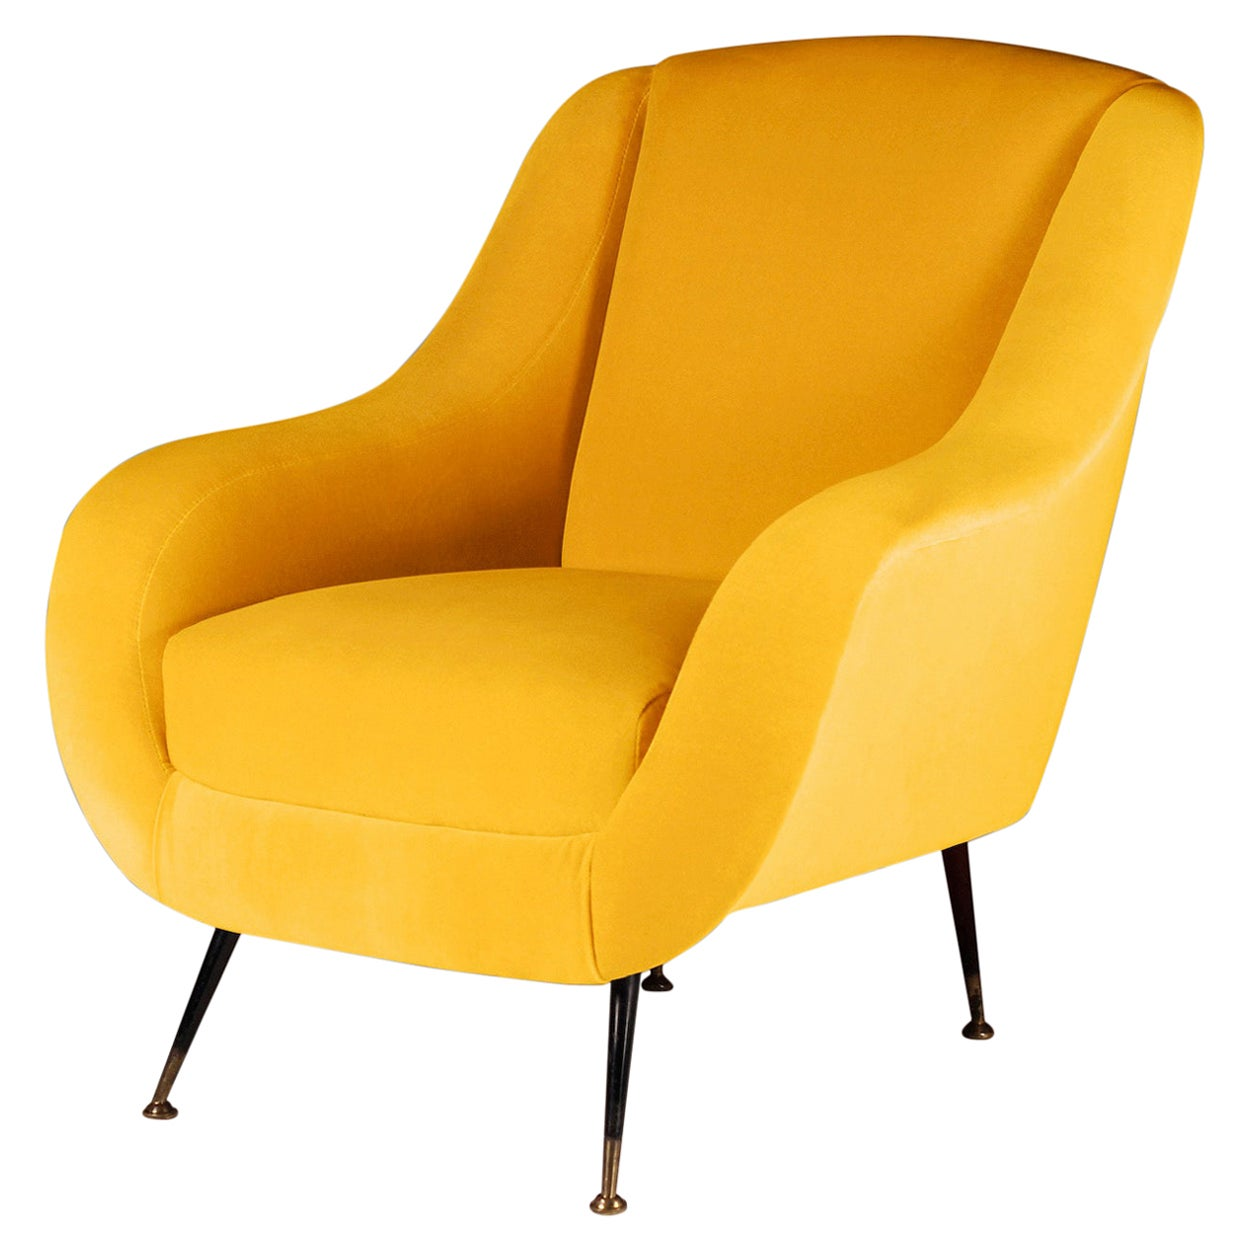 Midcentury Style Italian Lounge Chair Yellow